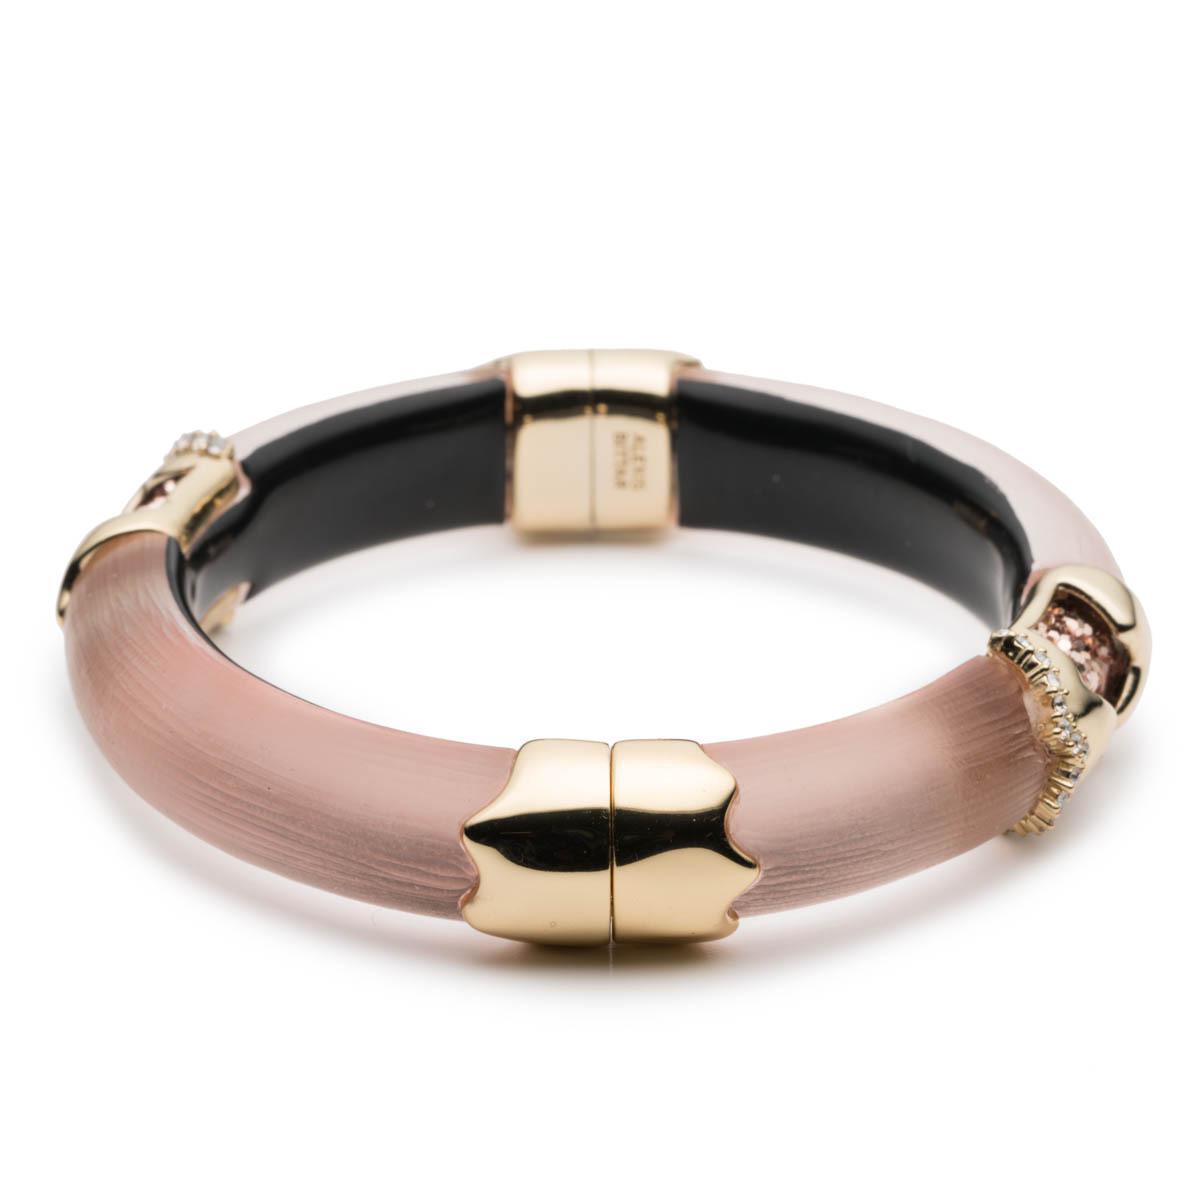 Alexis Bittar Crystal Encrusted Jagged Hinge Bracelet Sunset uUC1e